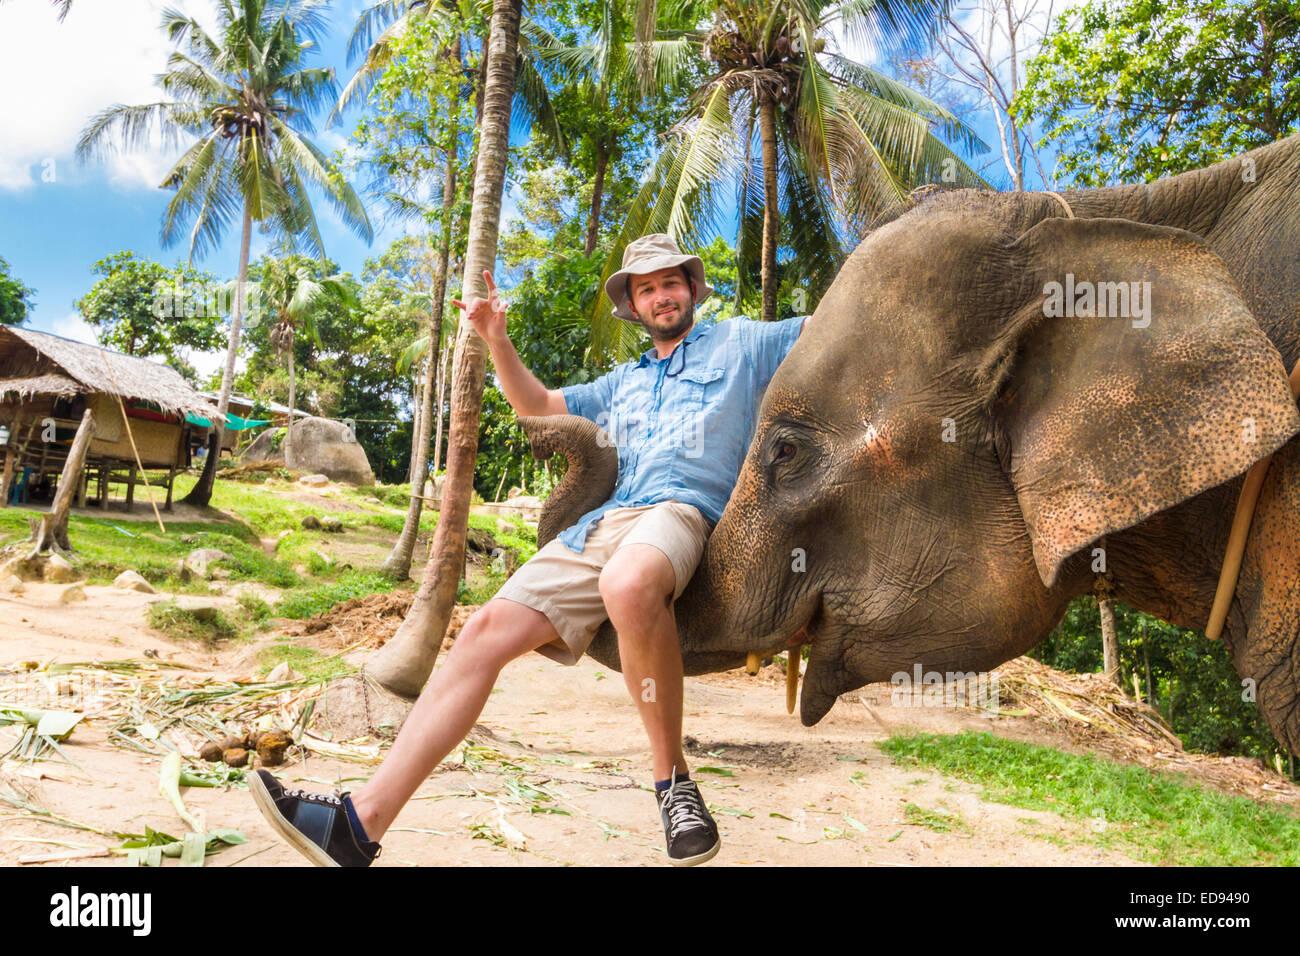 Elephan lifting a tourist. - Stock Image